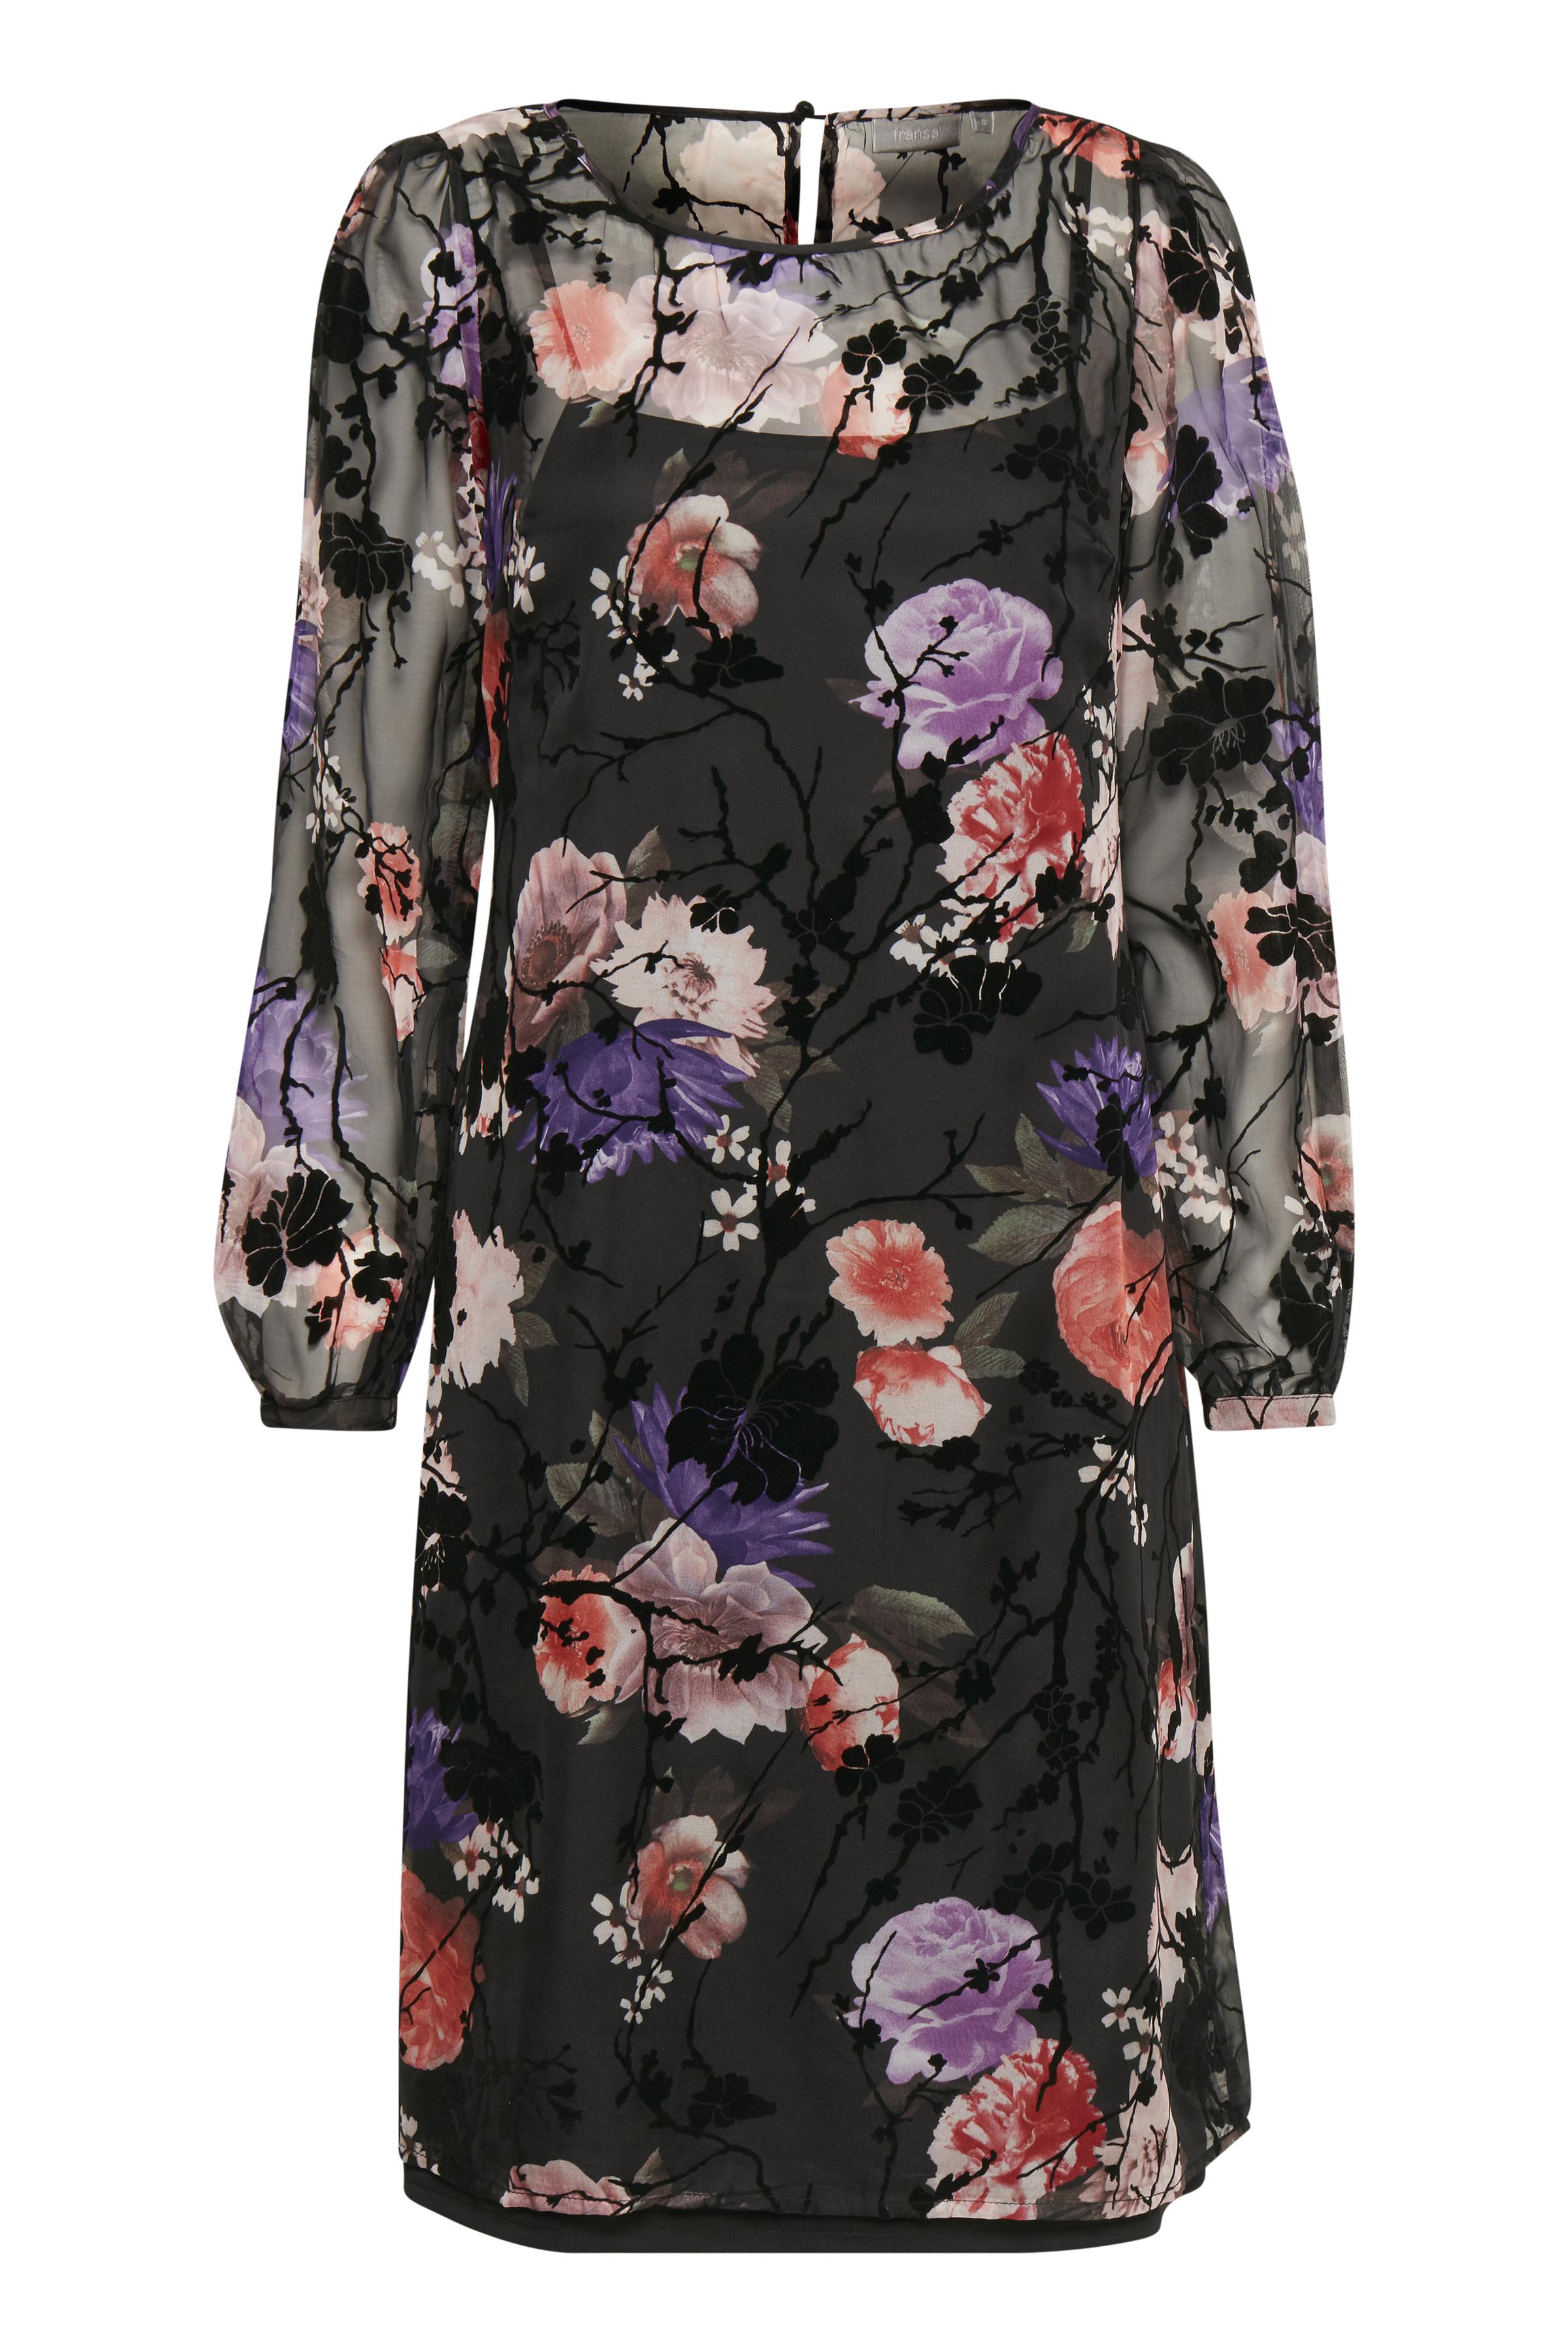 Fransa Dame Letvævet, let transparent chiffon kjole - Sort/rød